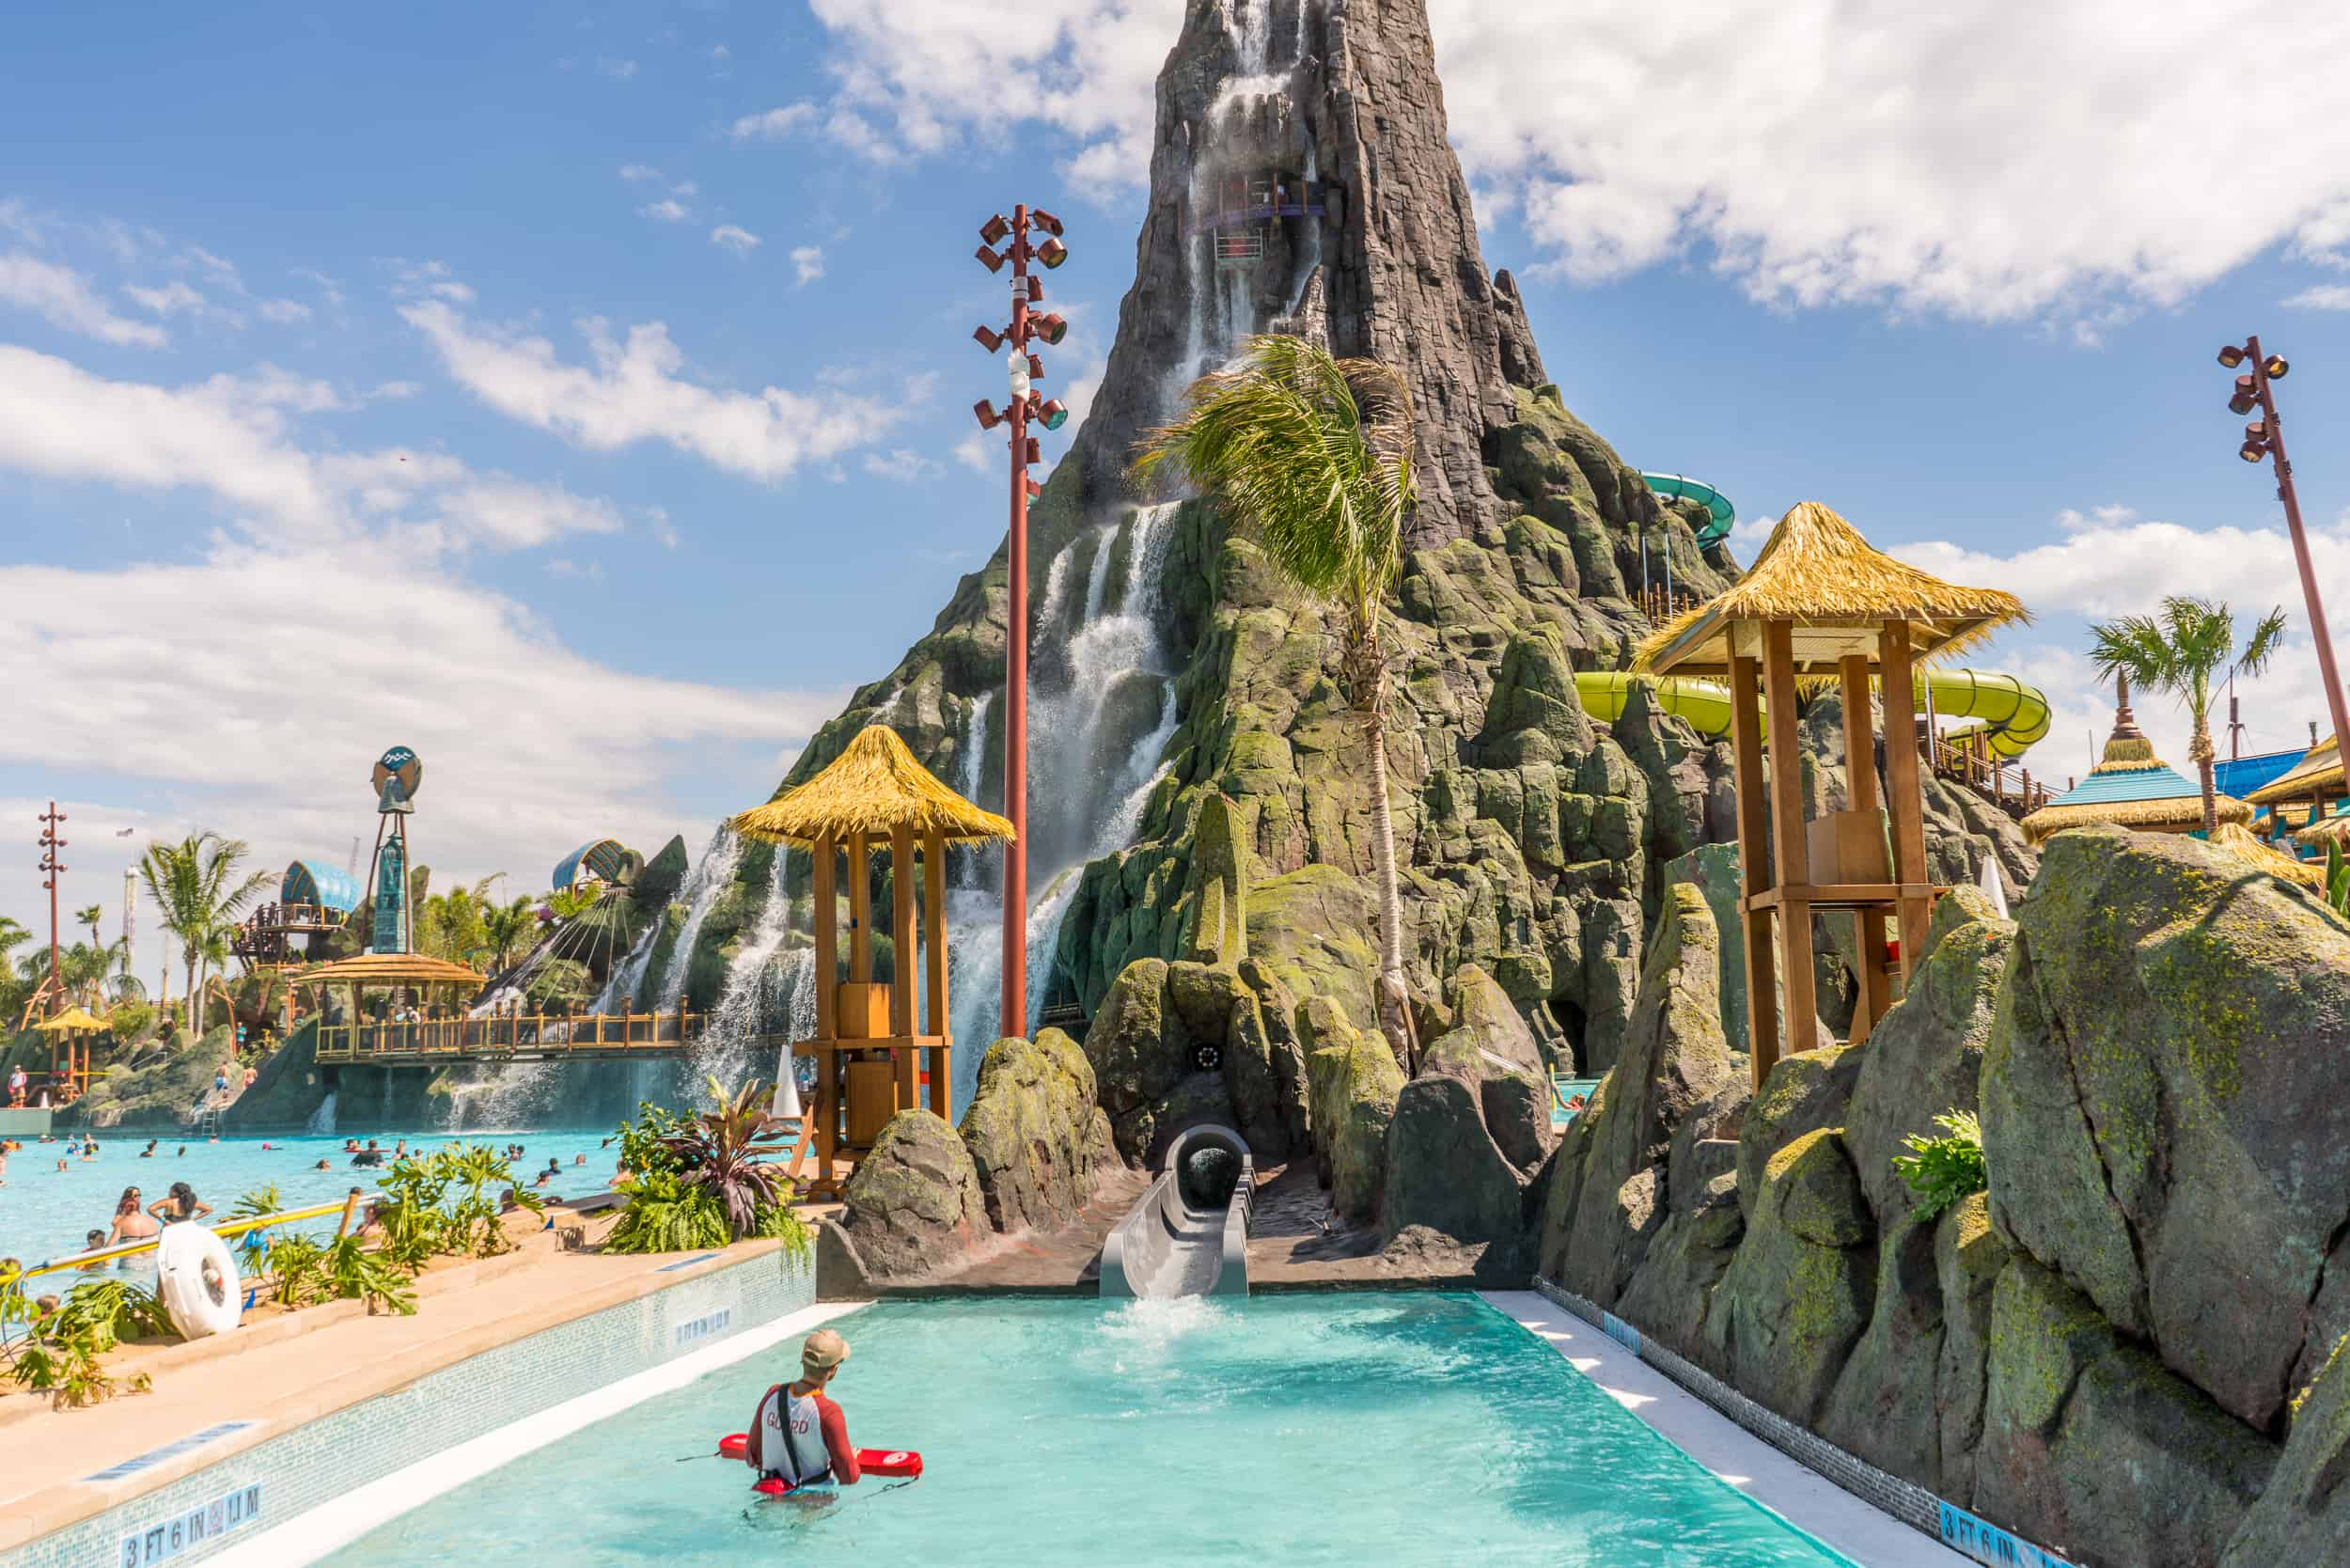 Ko'okiri slide exits into a pool at the foot of Krakatau volcano